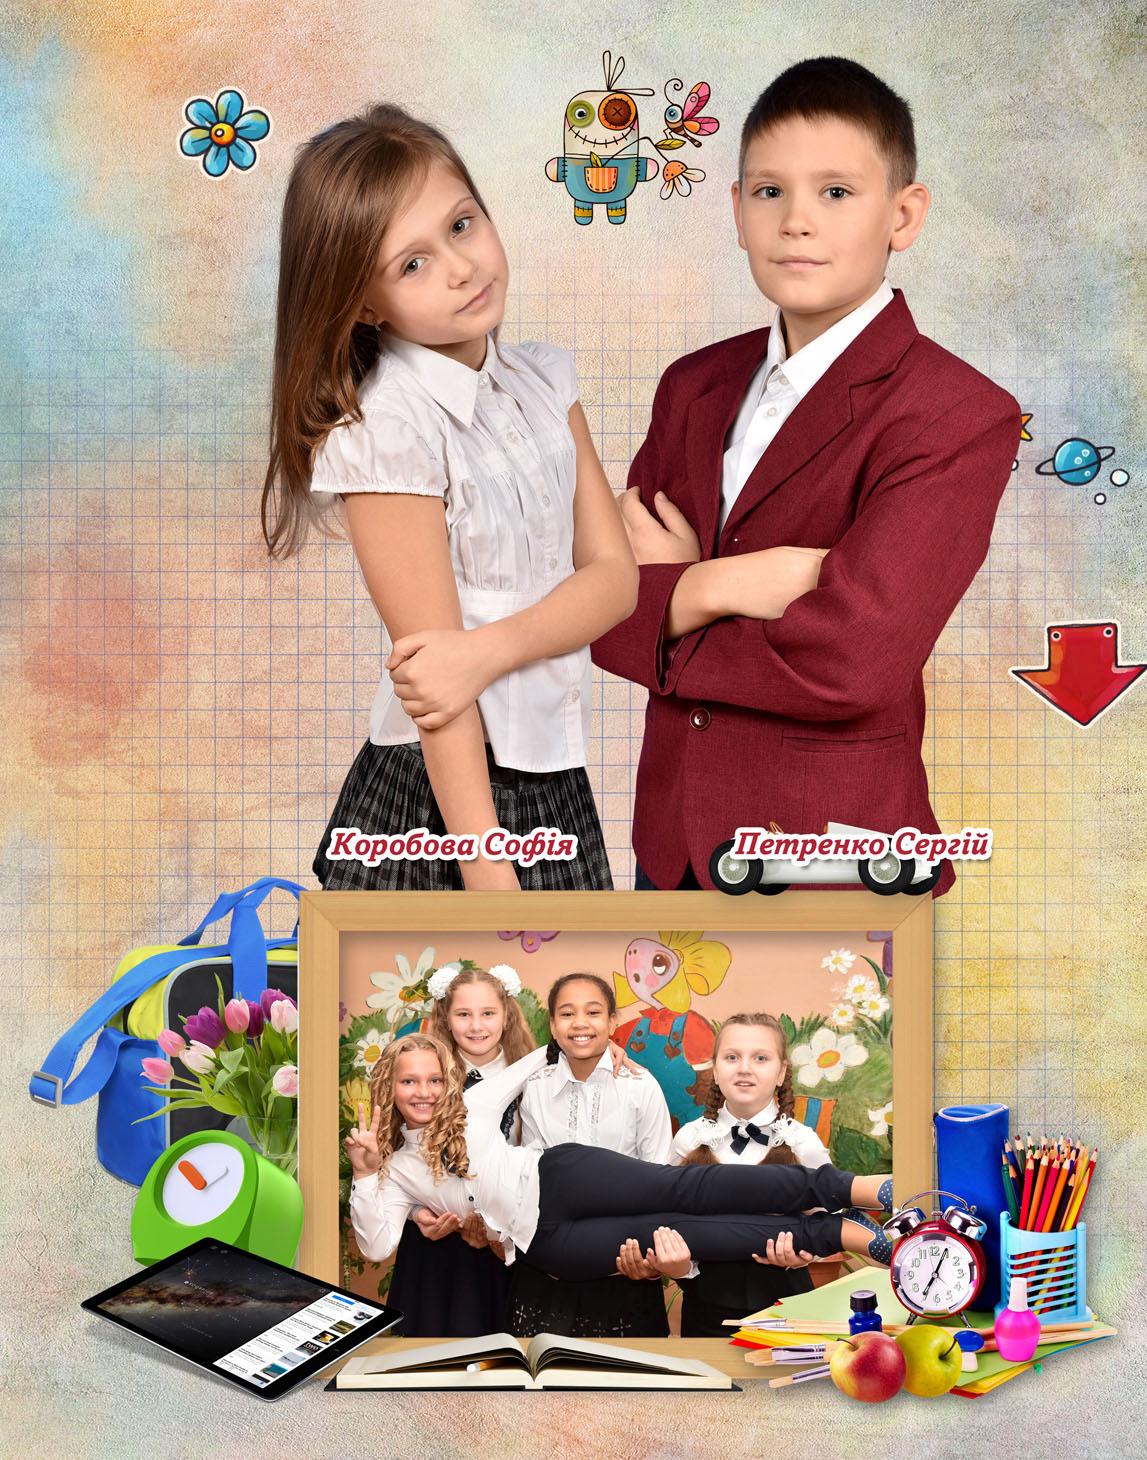 https://school-photo.com.ua/wp-content/uploads/2017/09/13-copy-2.jpg